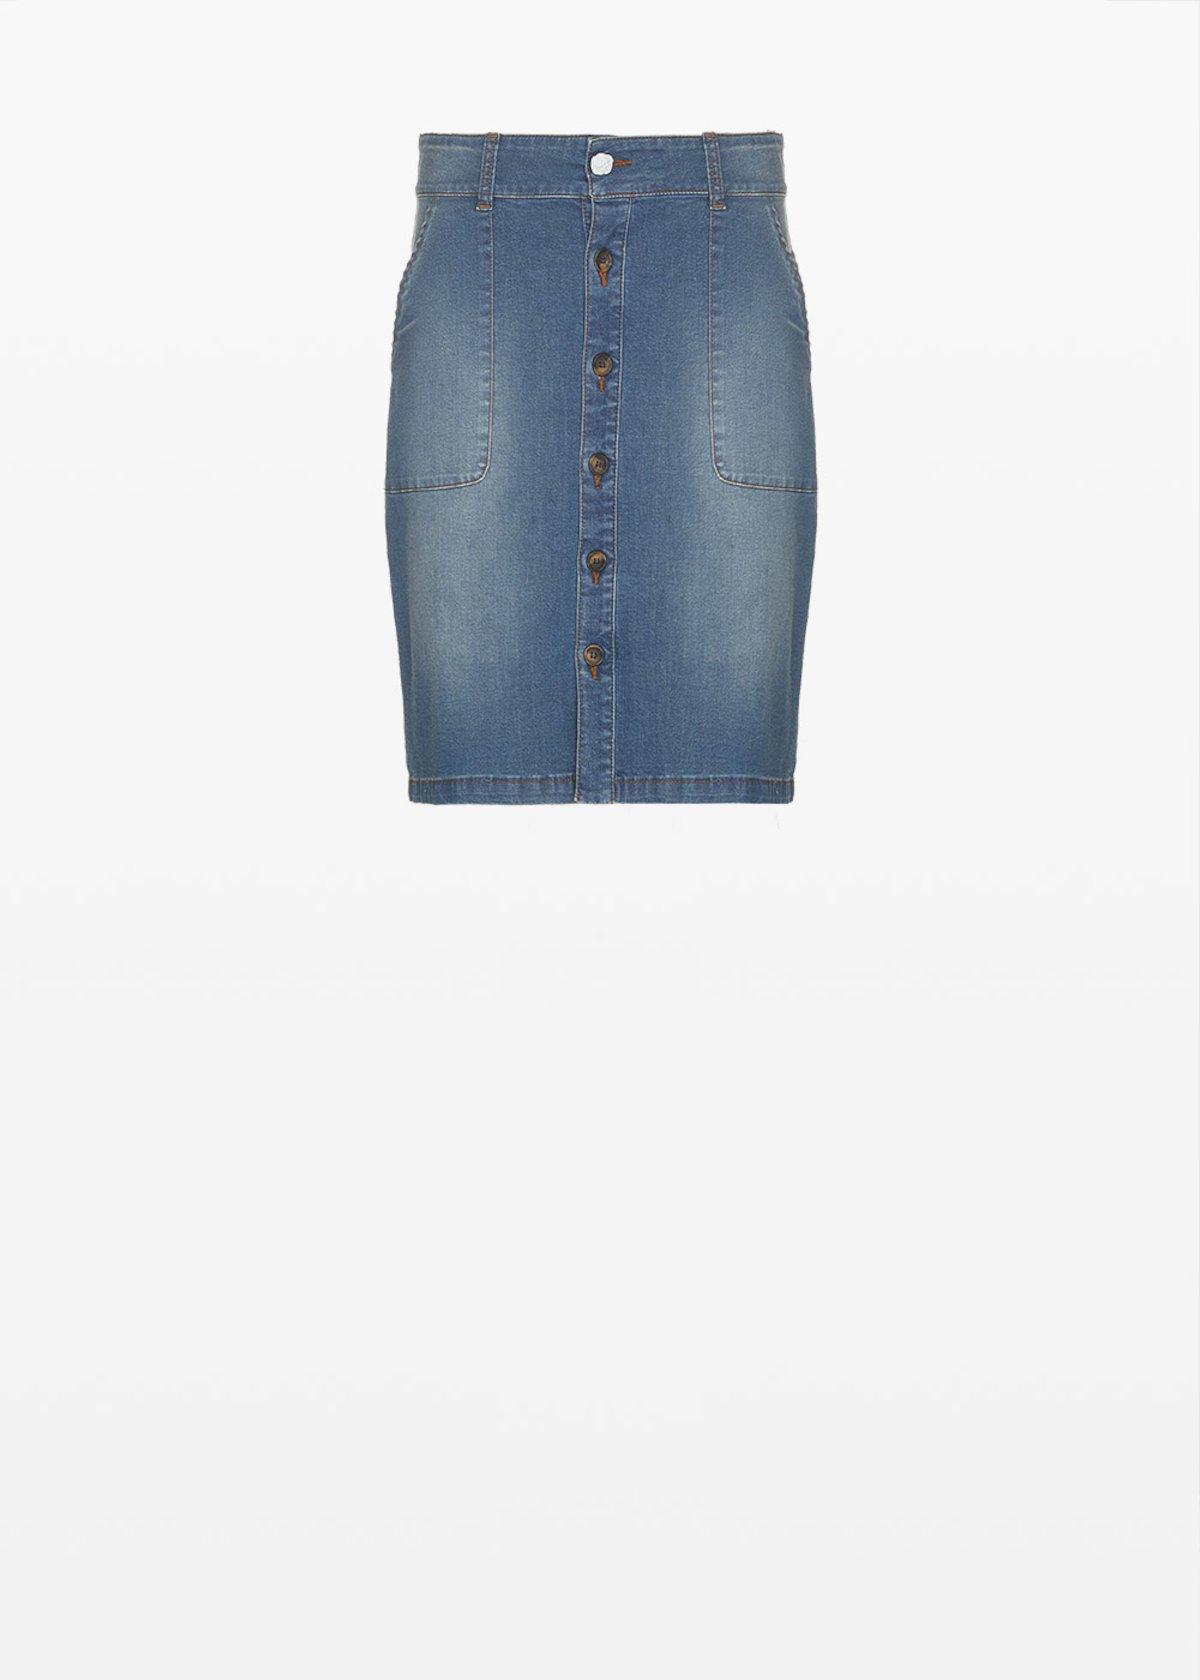 Giusy denim skirt - Blue - Woman - Category image